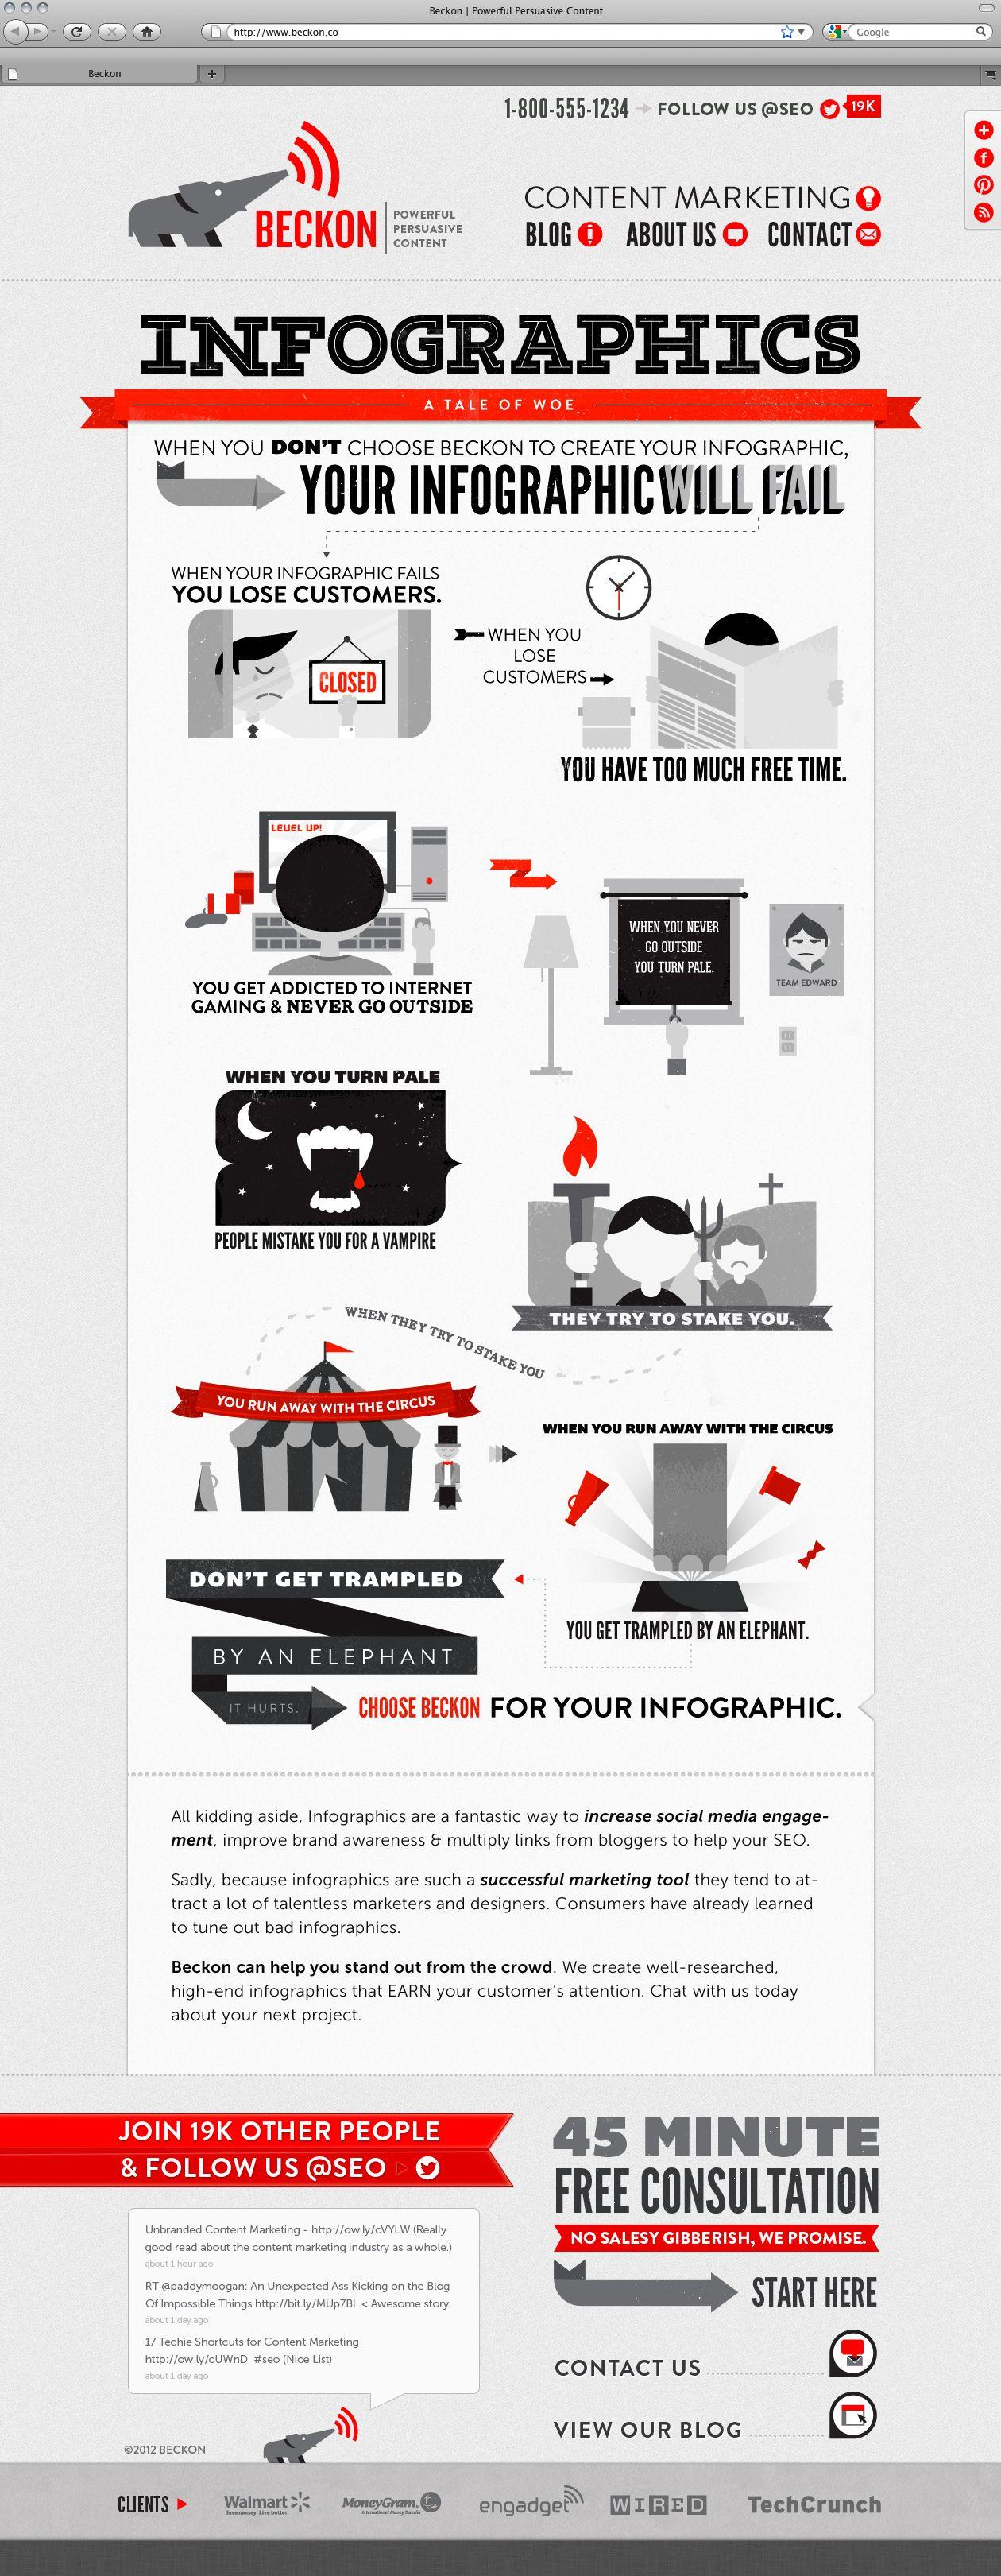 Beckon Infographic - dangerdom